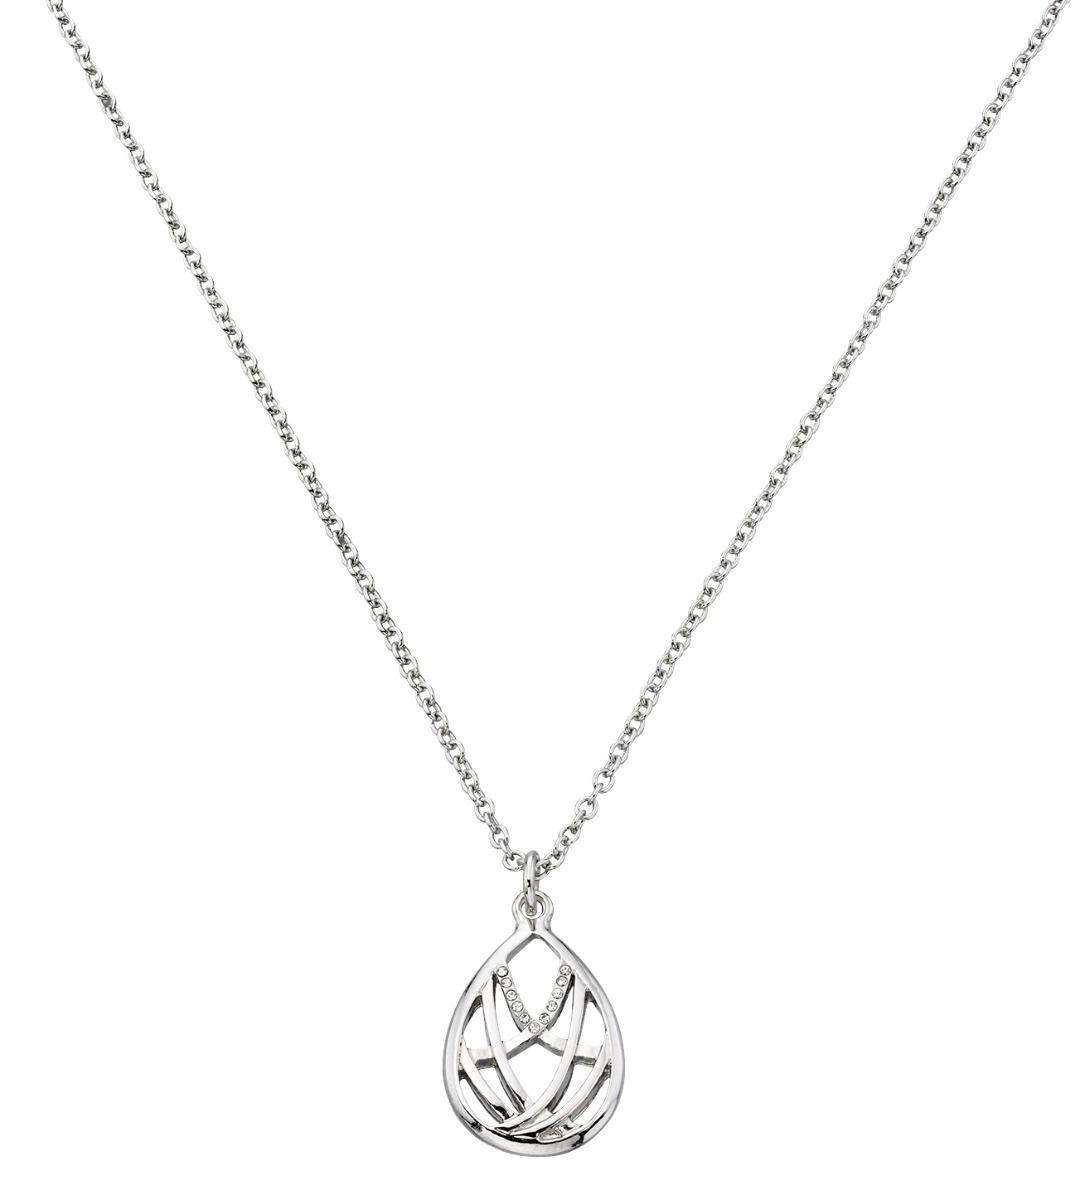 Fiorelli Fashion Imitation Rhodium Plated Pave Crystal Teardrop Necklace 47cm + 5cm